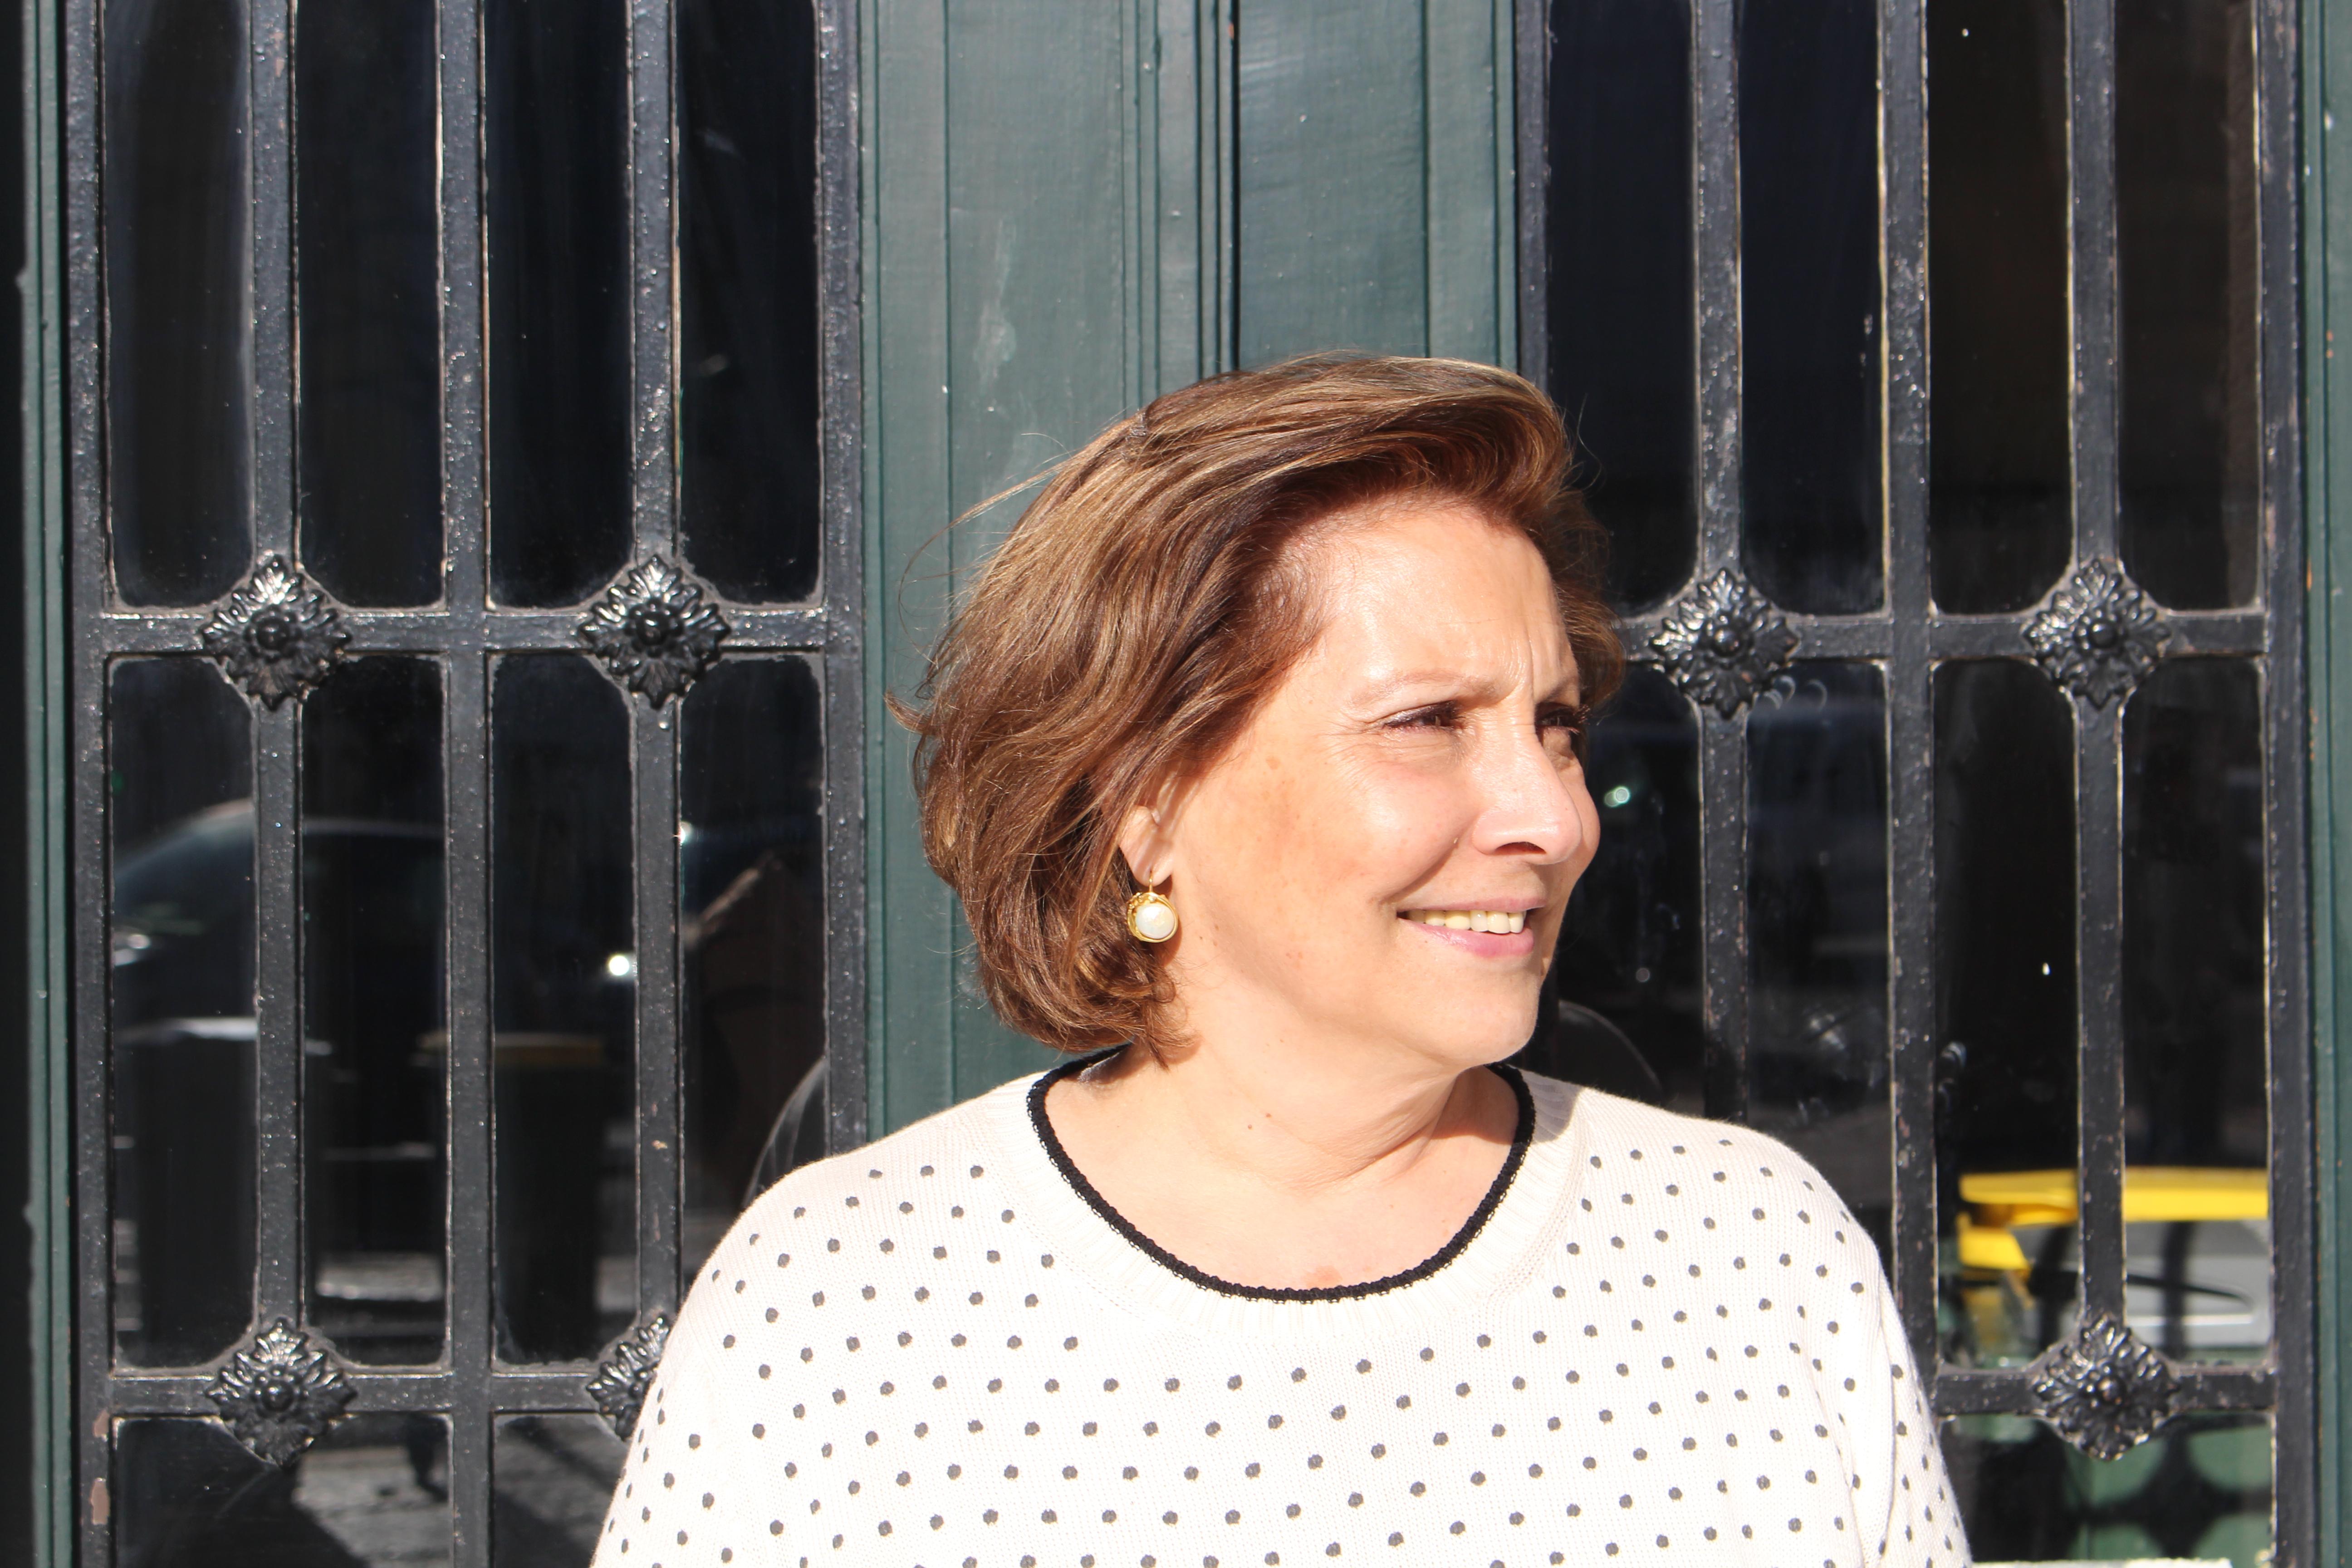 Margarida Marcelino Marques